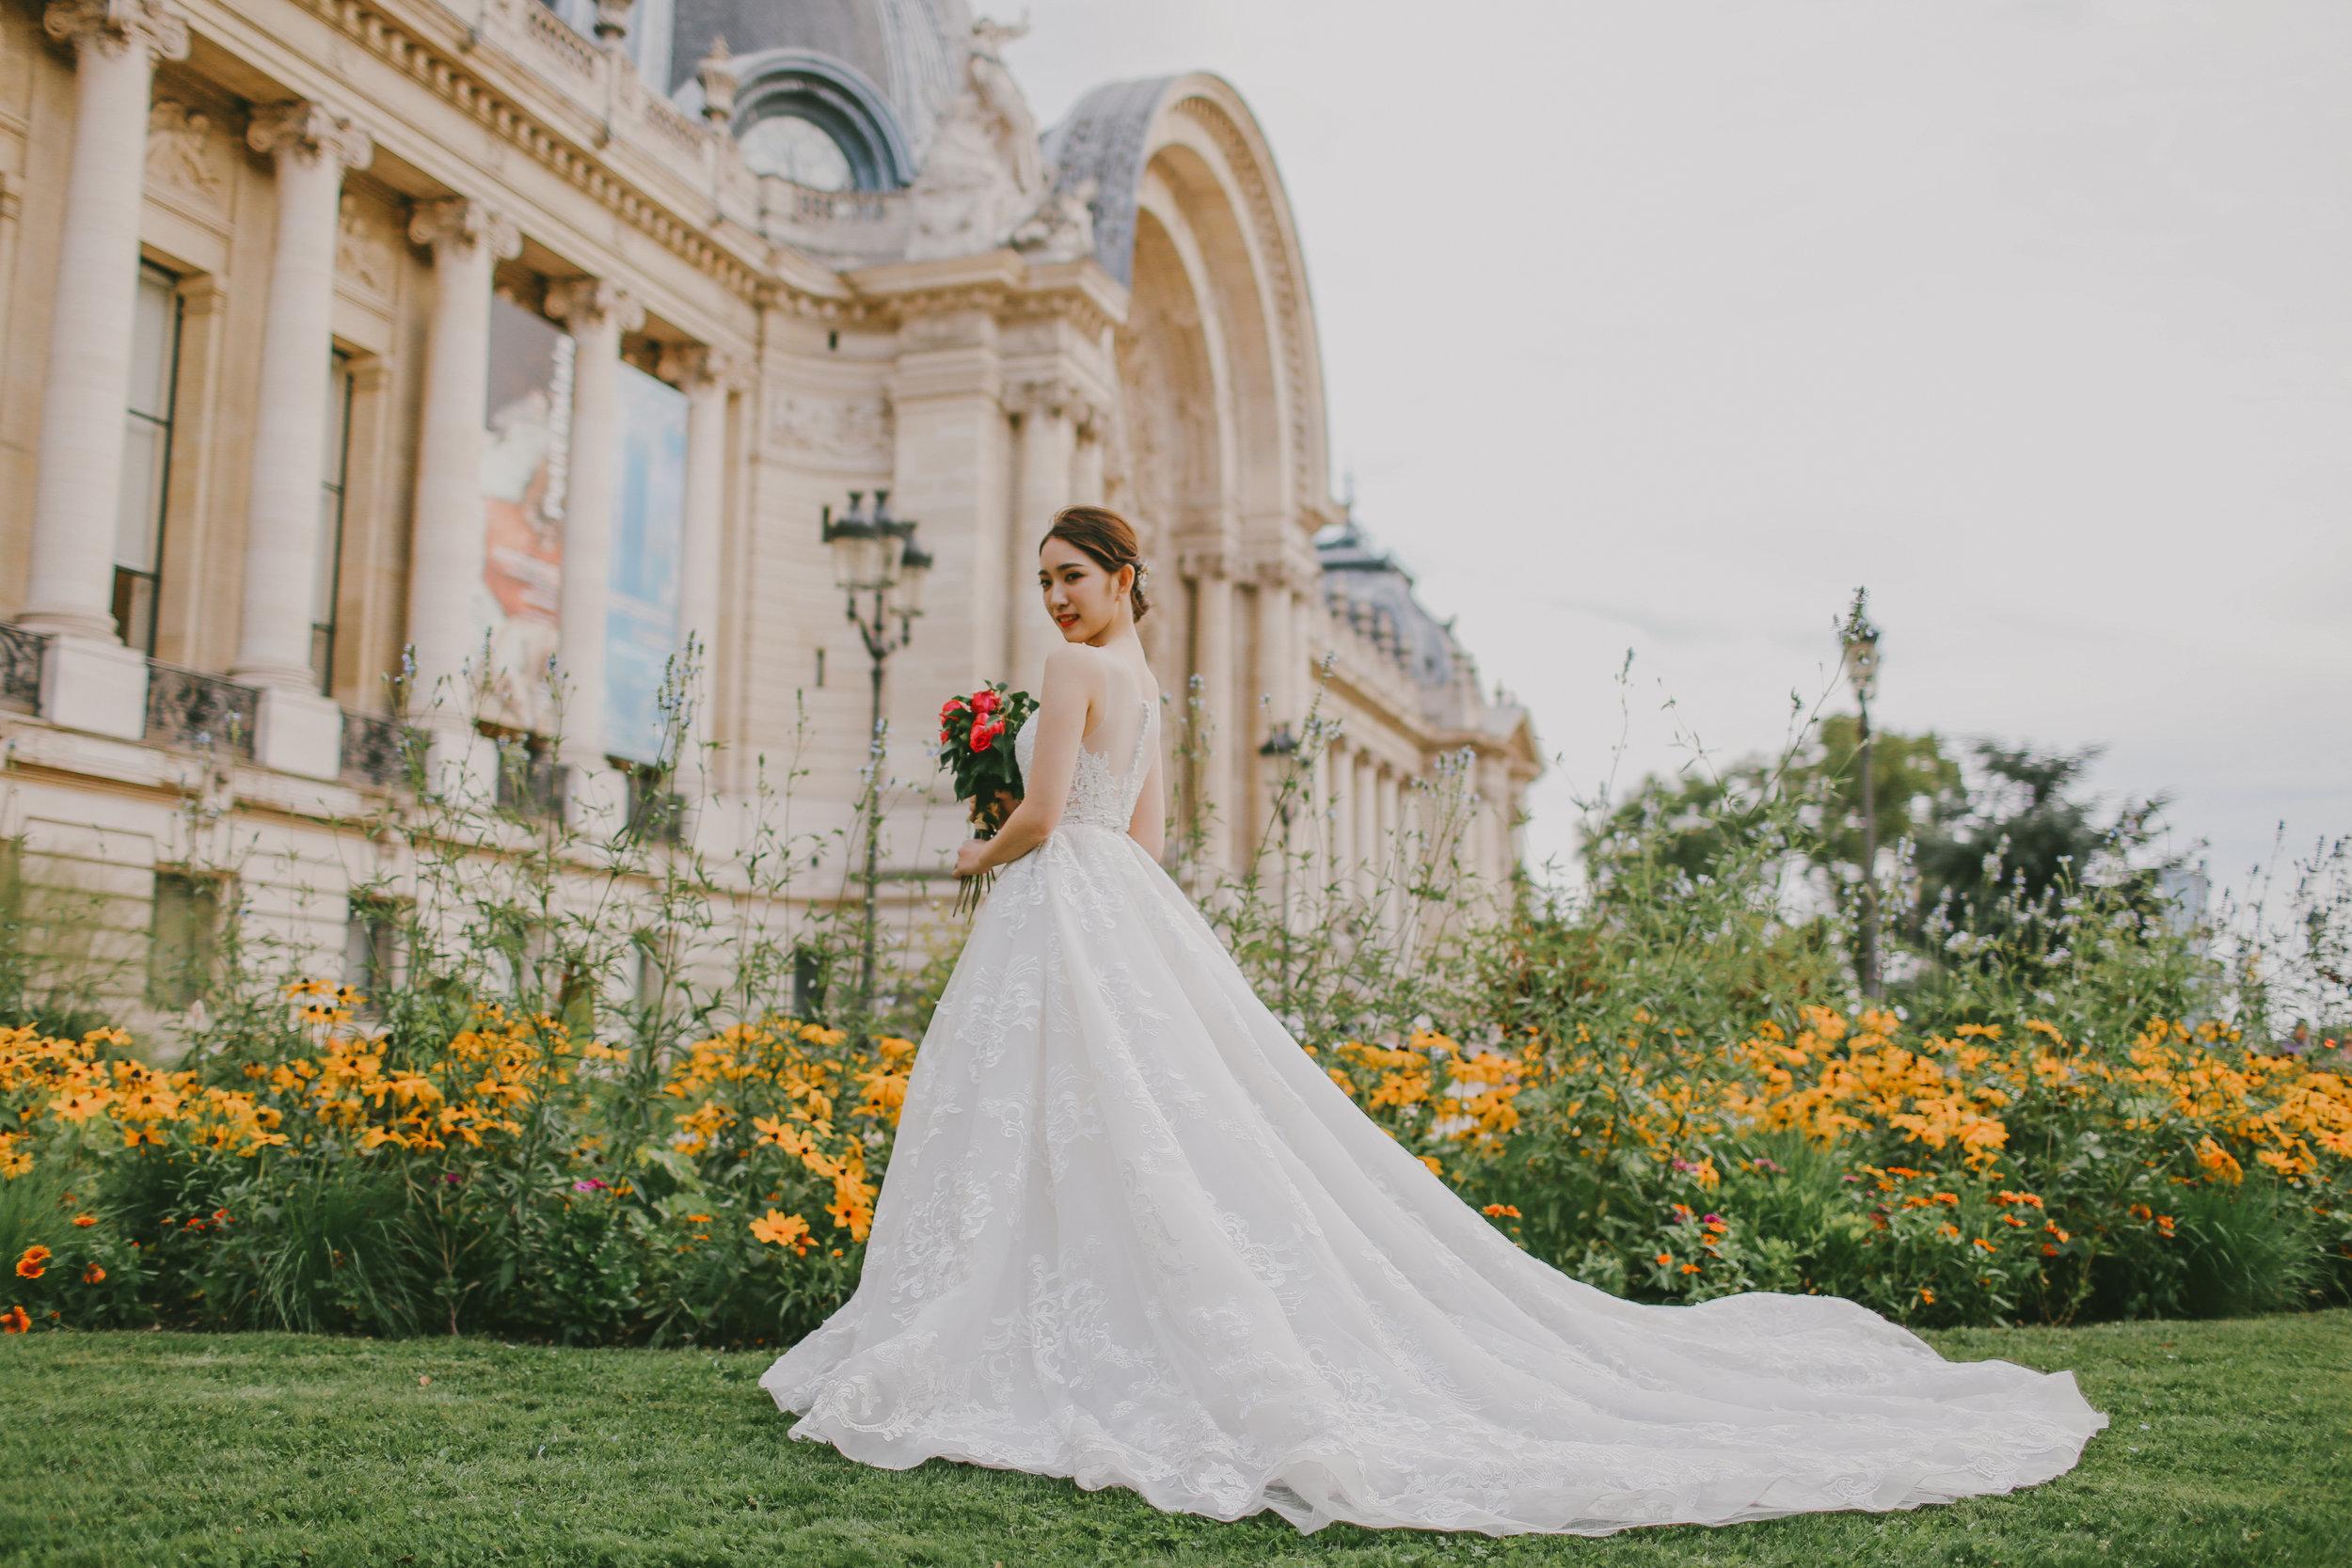 2018-pre-wedding-studio-numb9r-paris-high-1811e.jpg